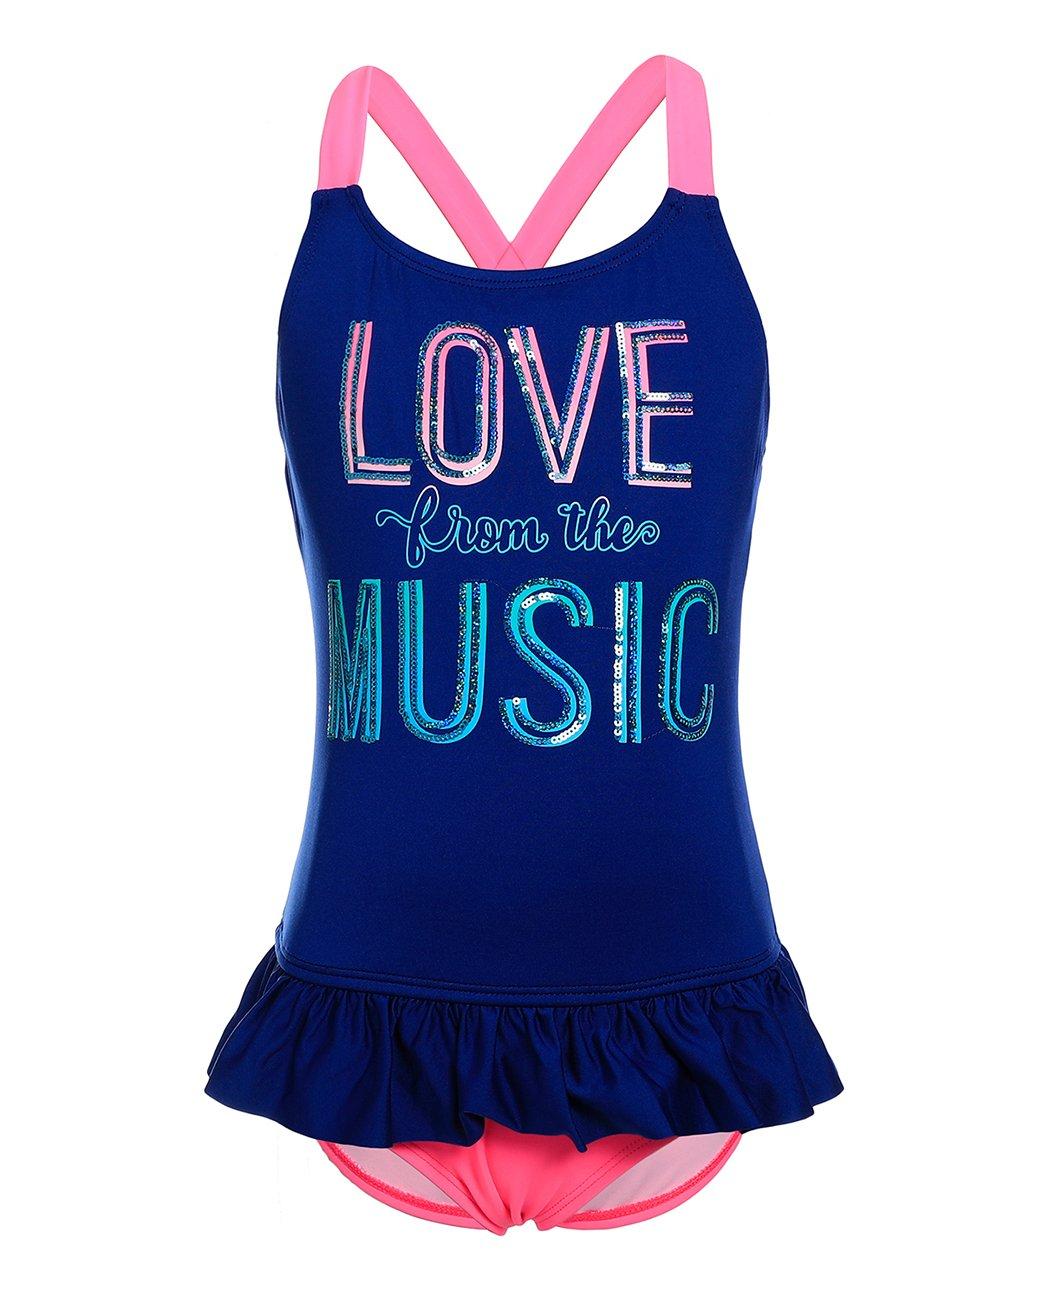 iDrawl Girls One Piece Skirty Swimwear Beach Criss Cross Swimsuit